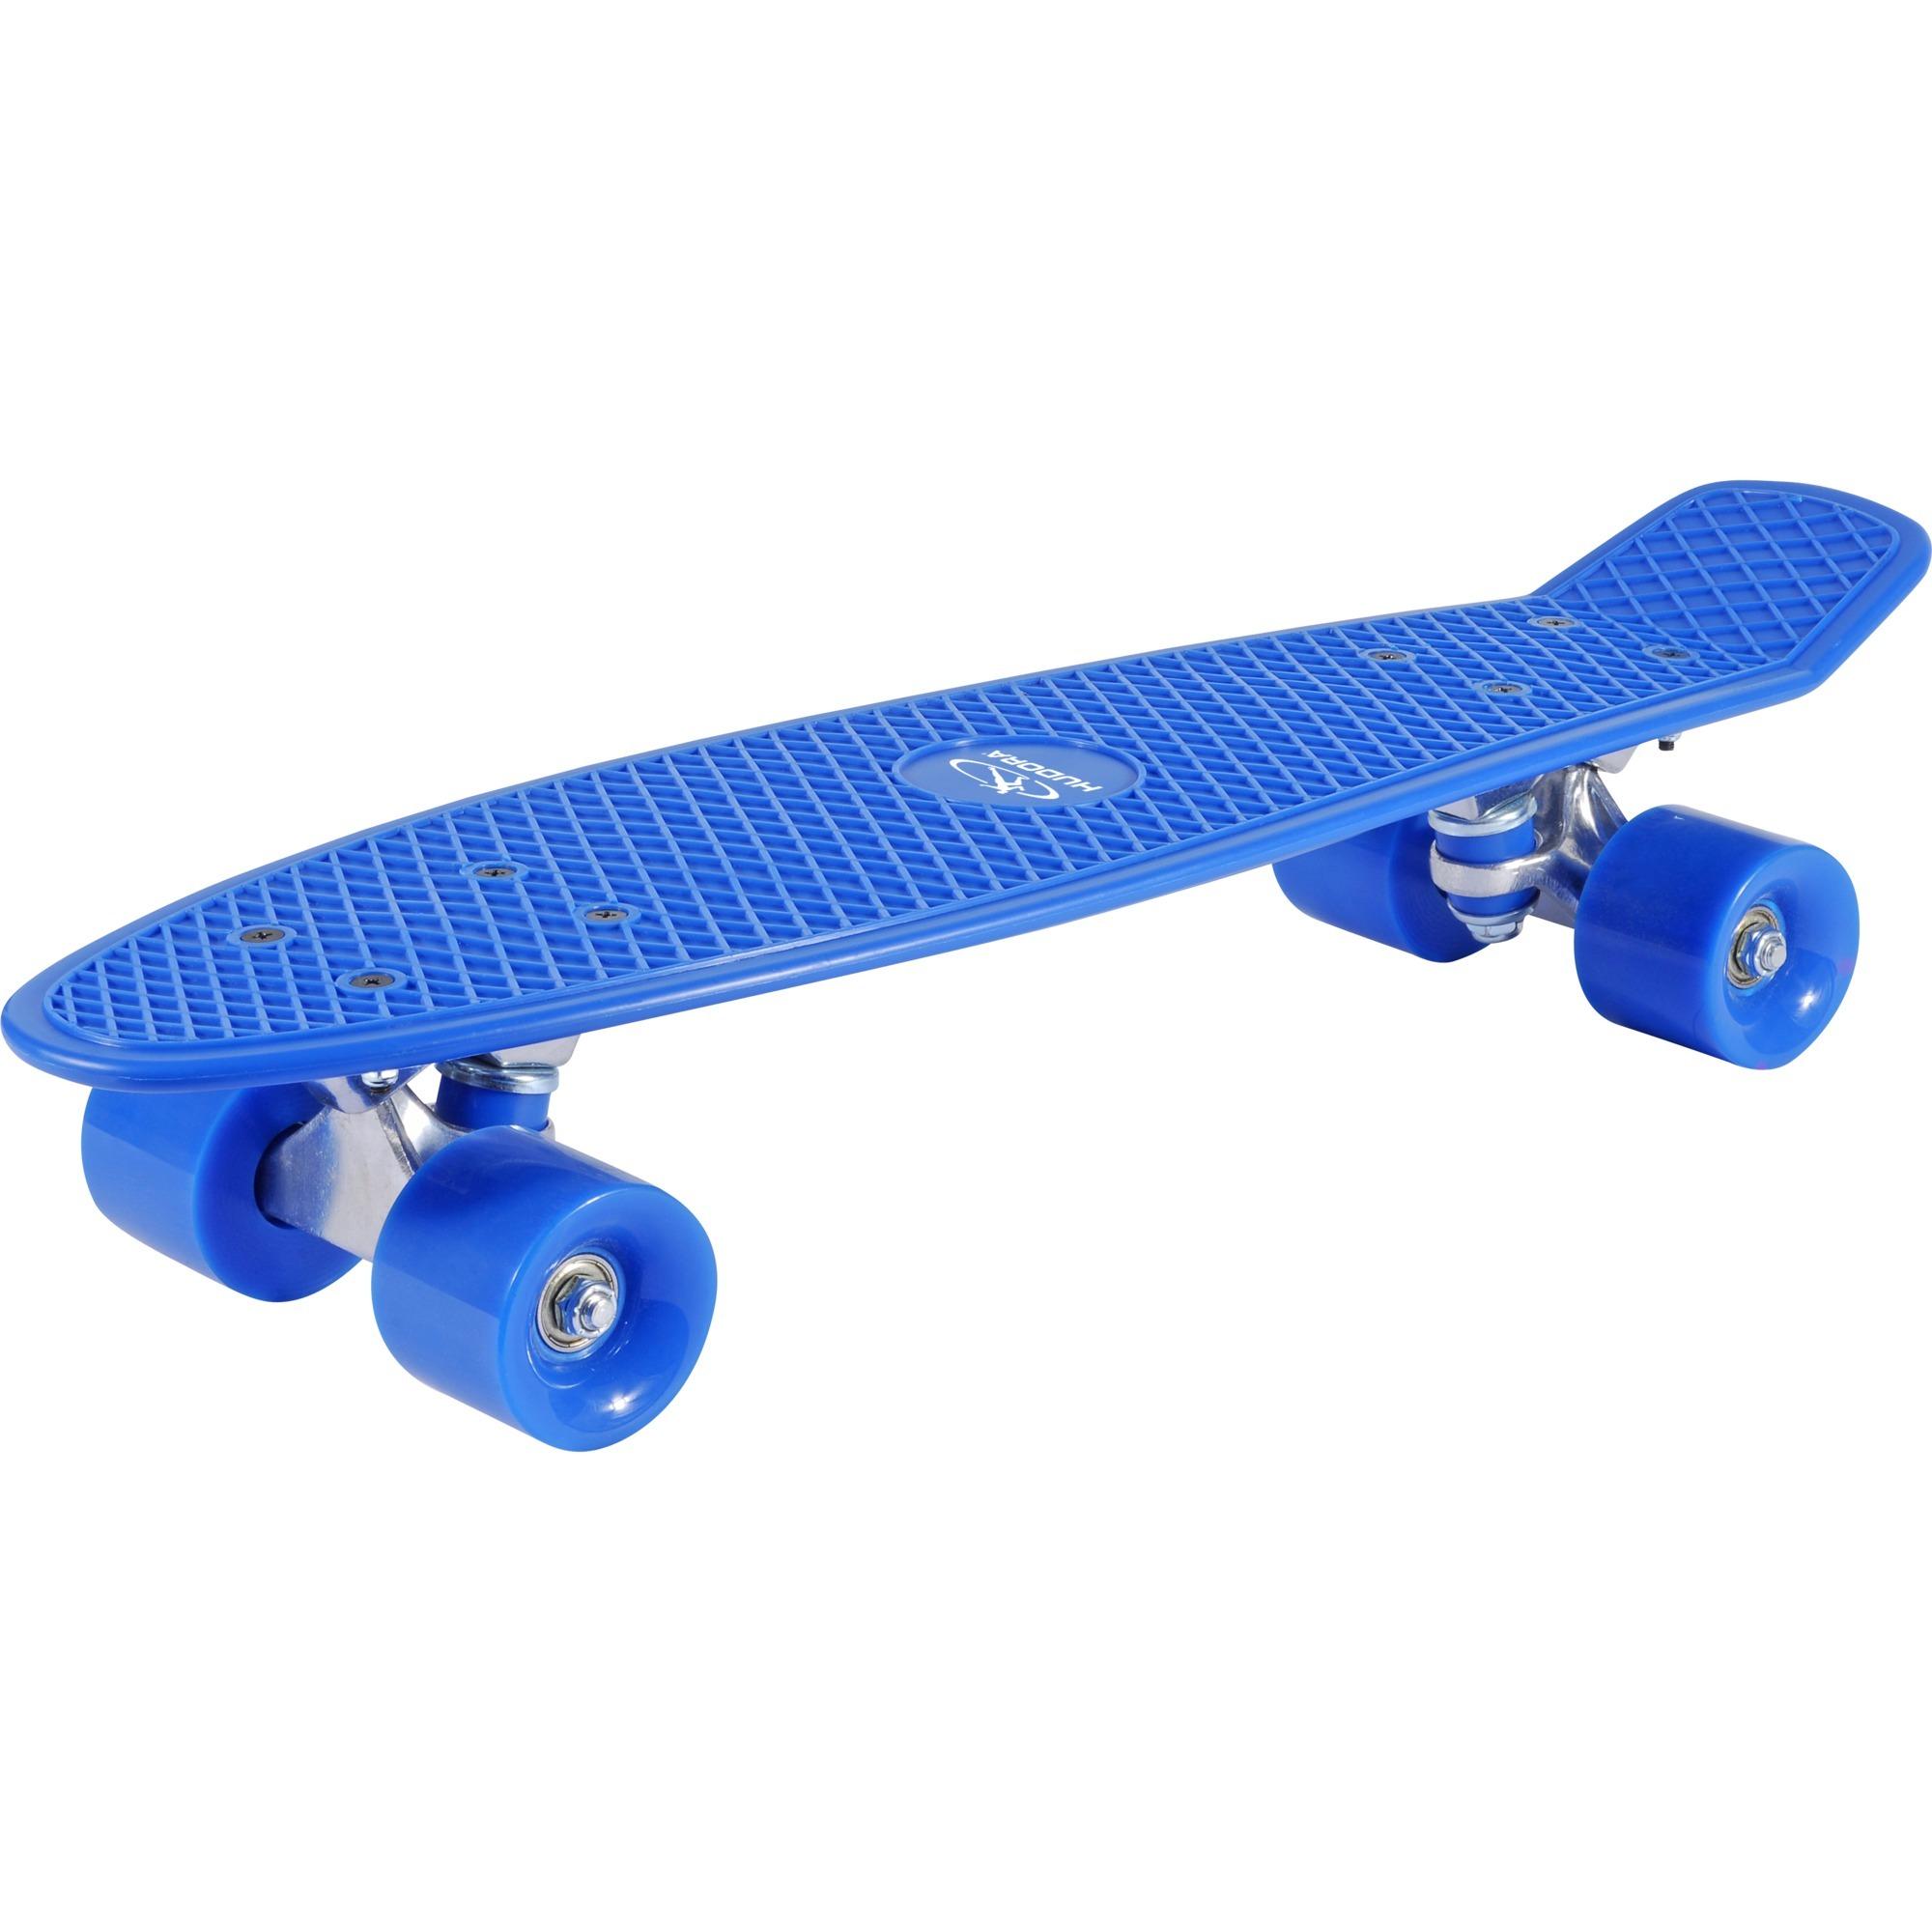 12137 Candy Board Azul monopatín, Skateboard